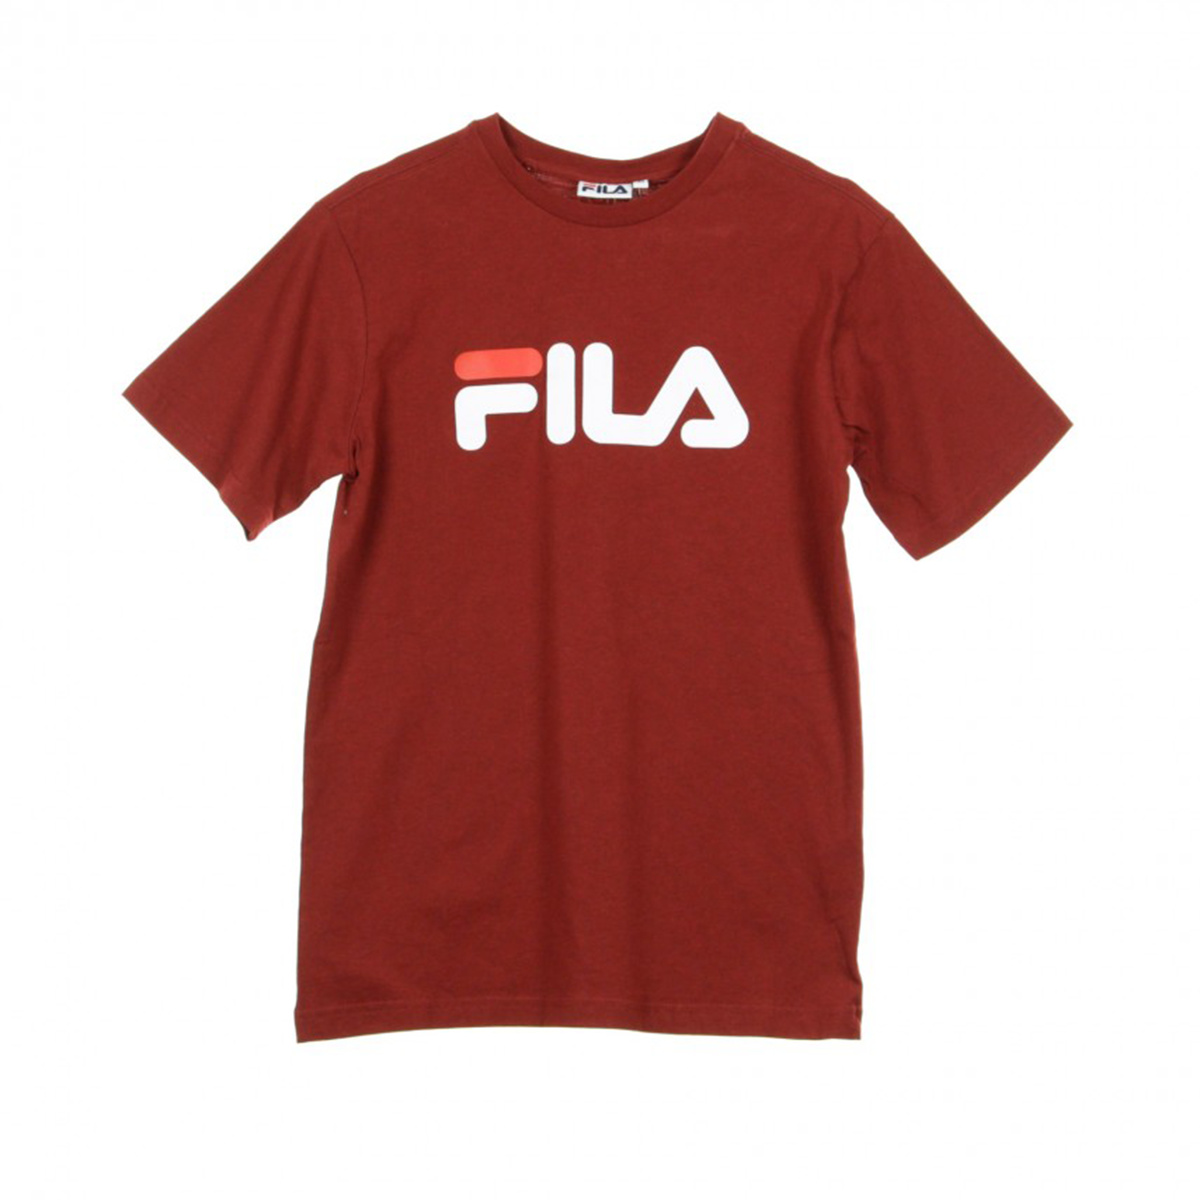 Fila T-Shirt Classic Logo Bright